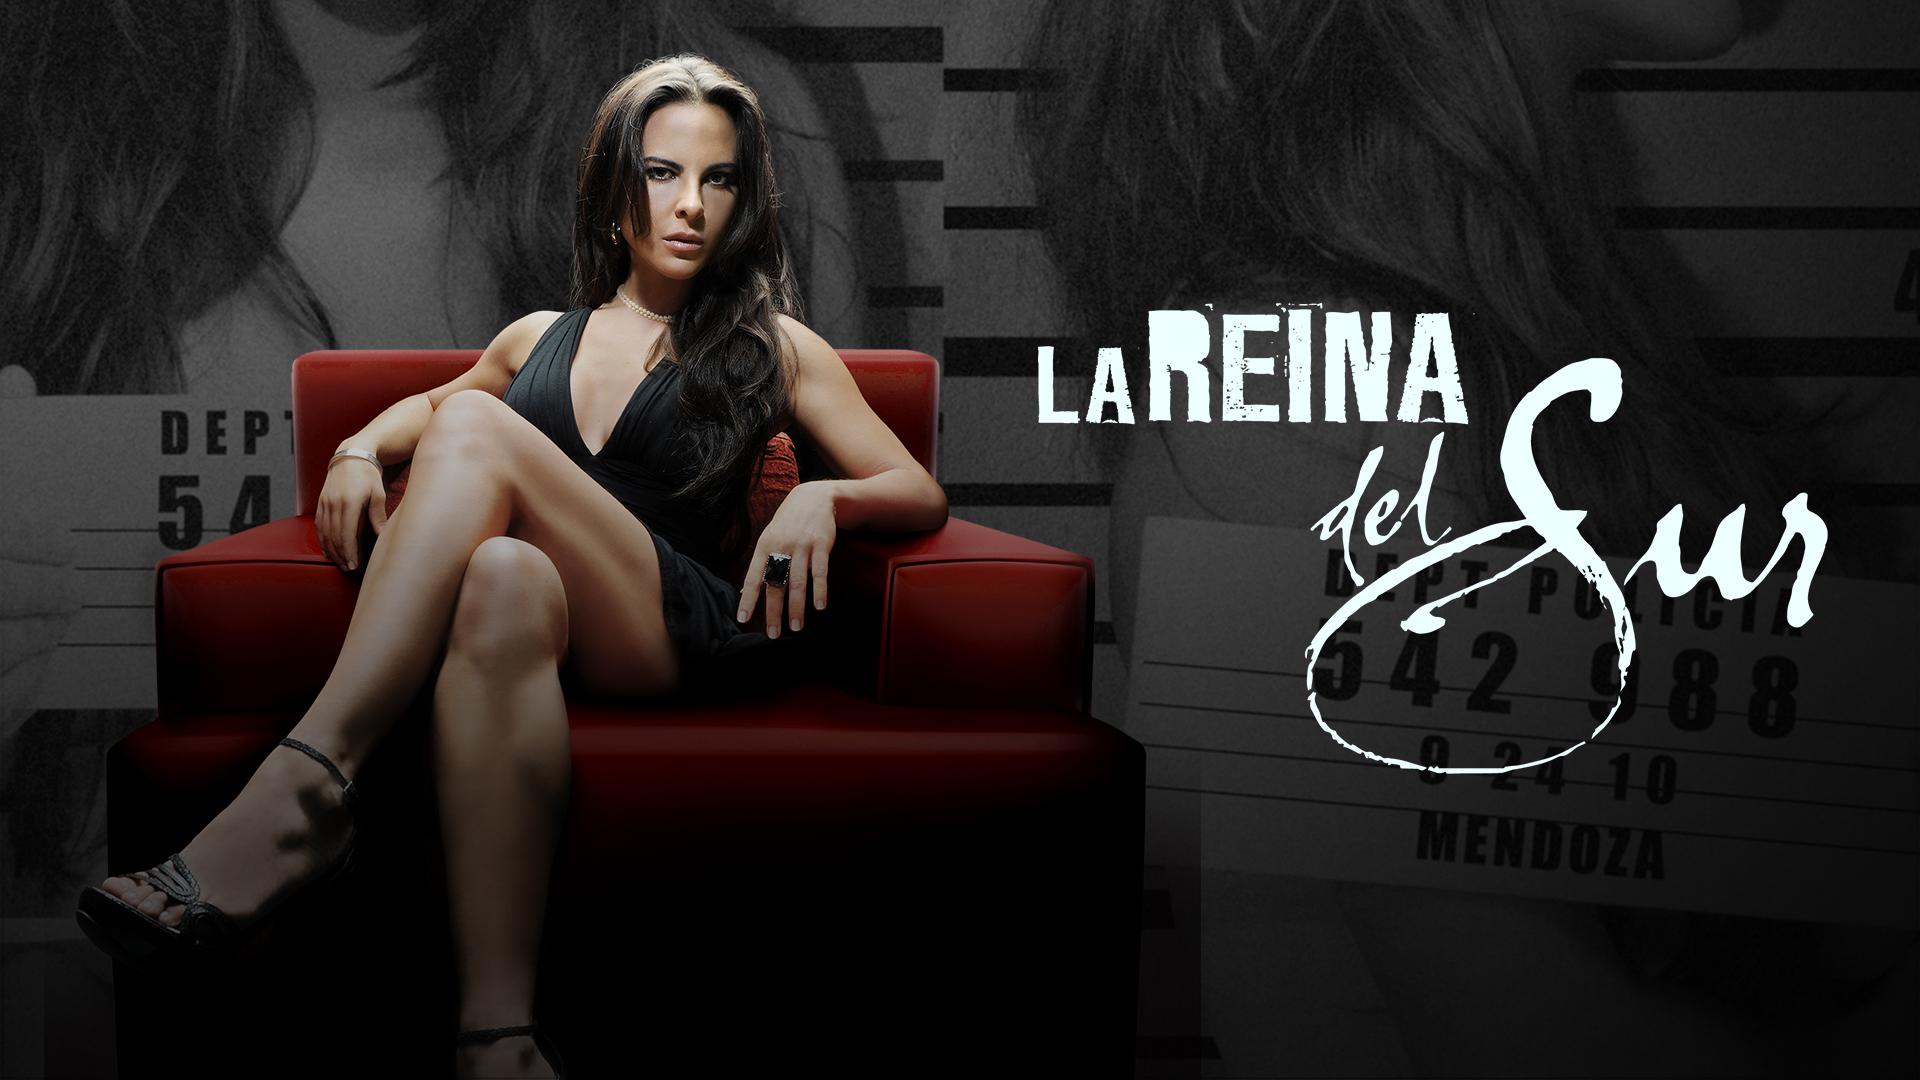 lareina